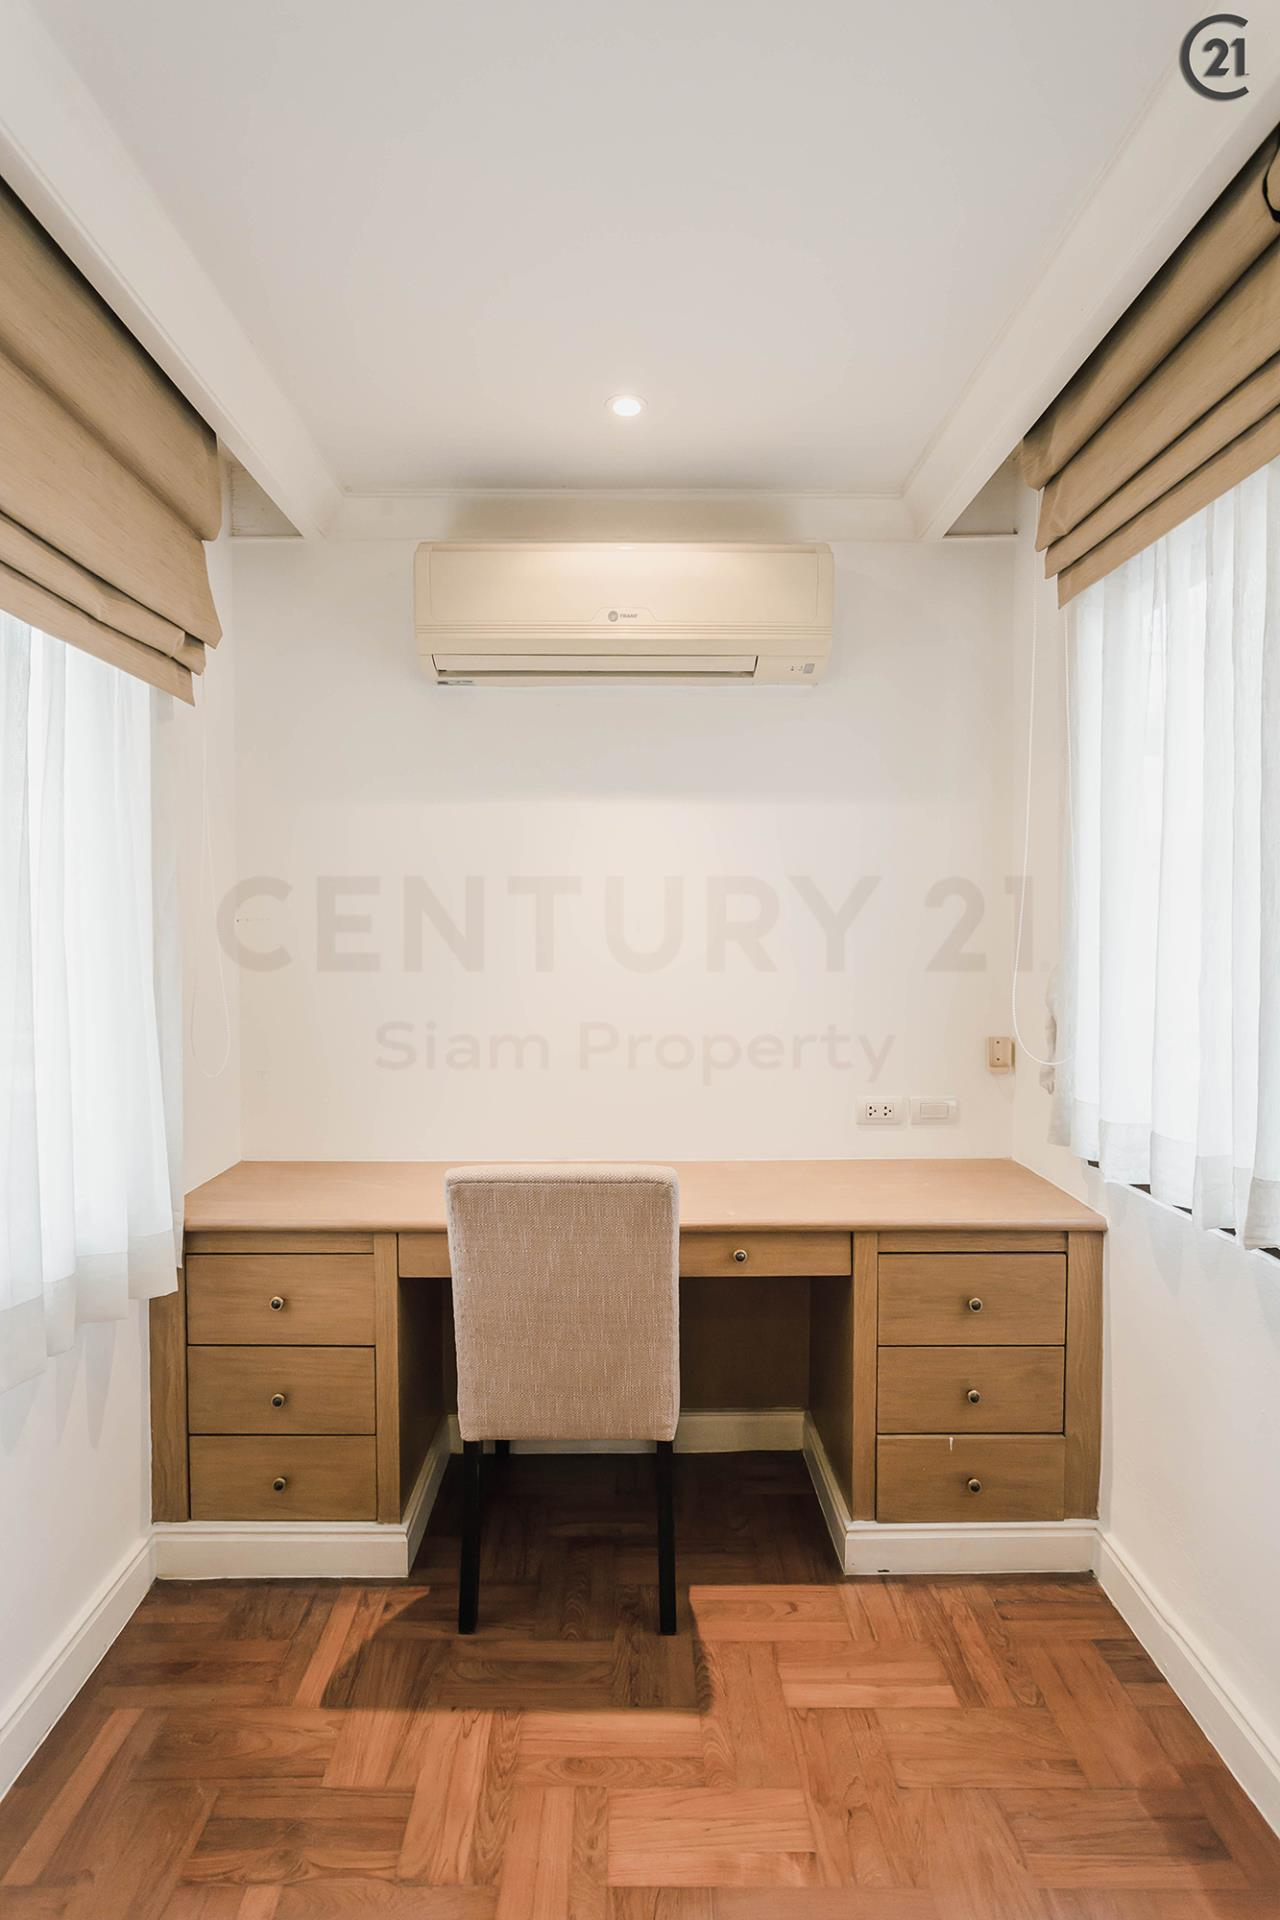 Century21 Siam Property Agency's Baan Sawadee 26